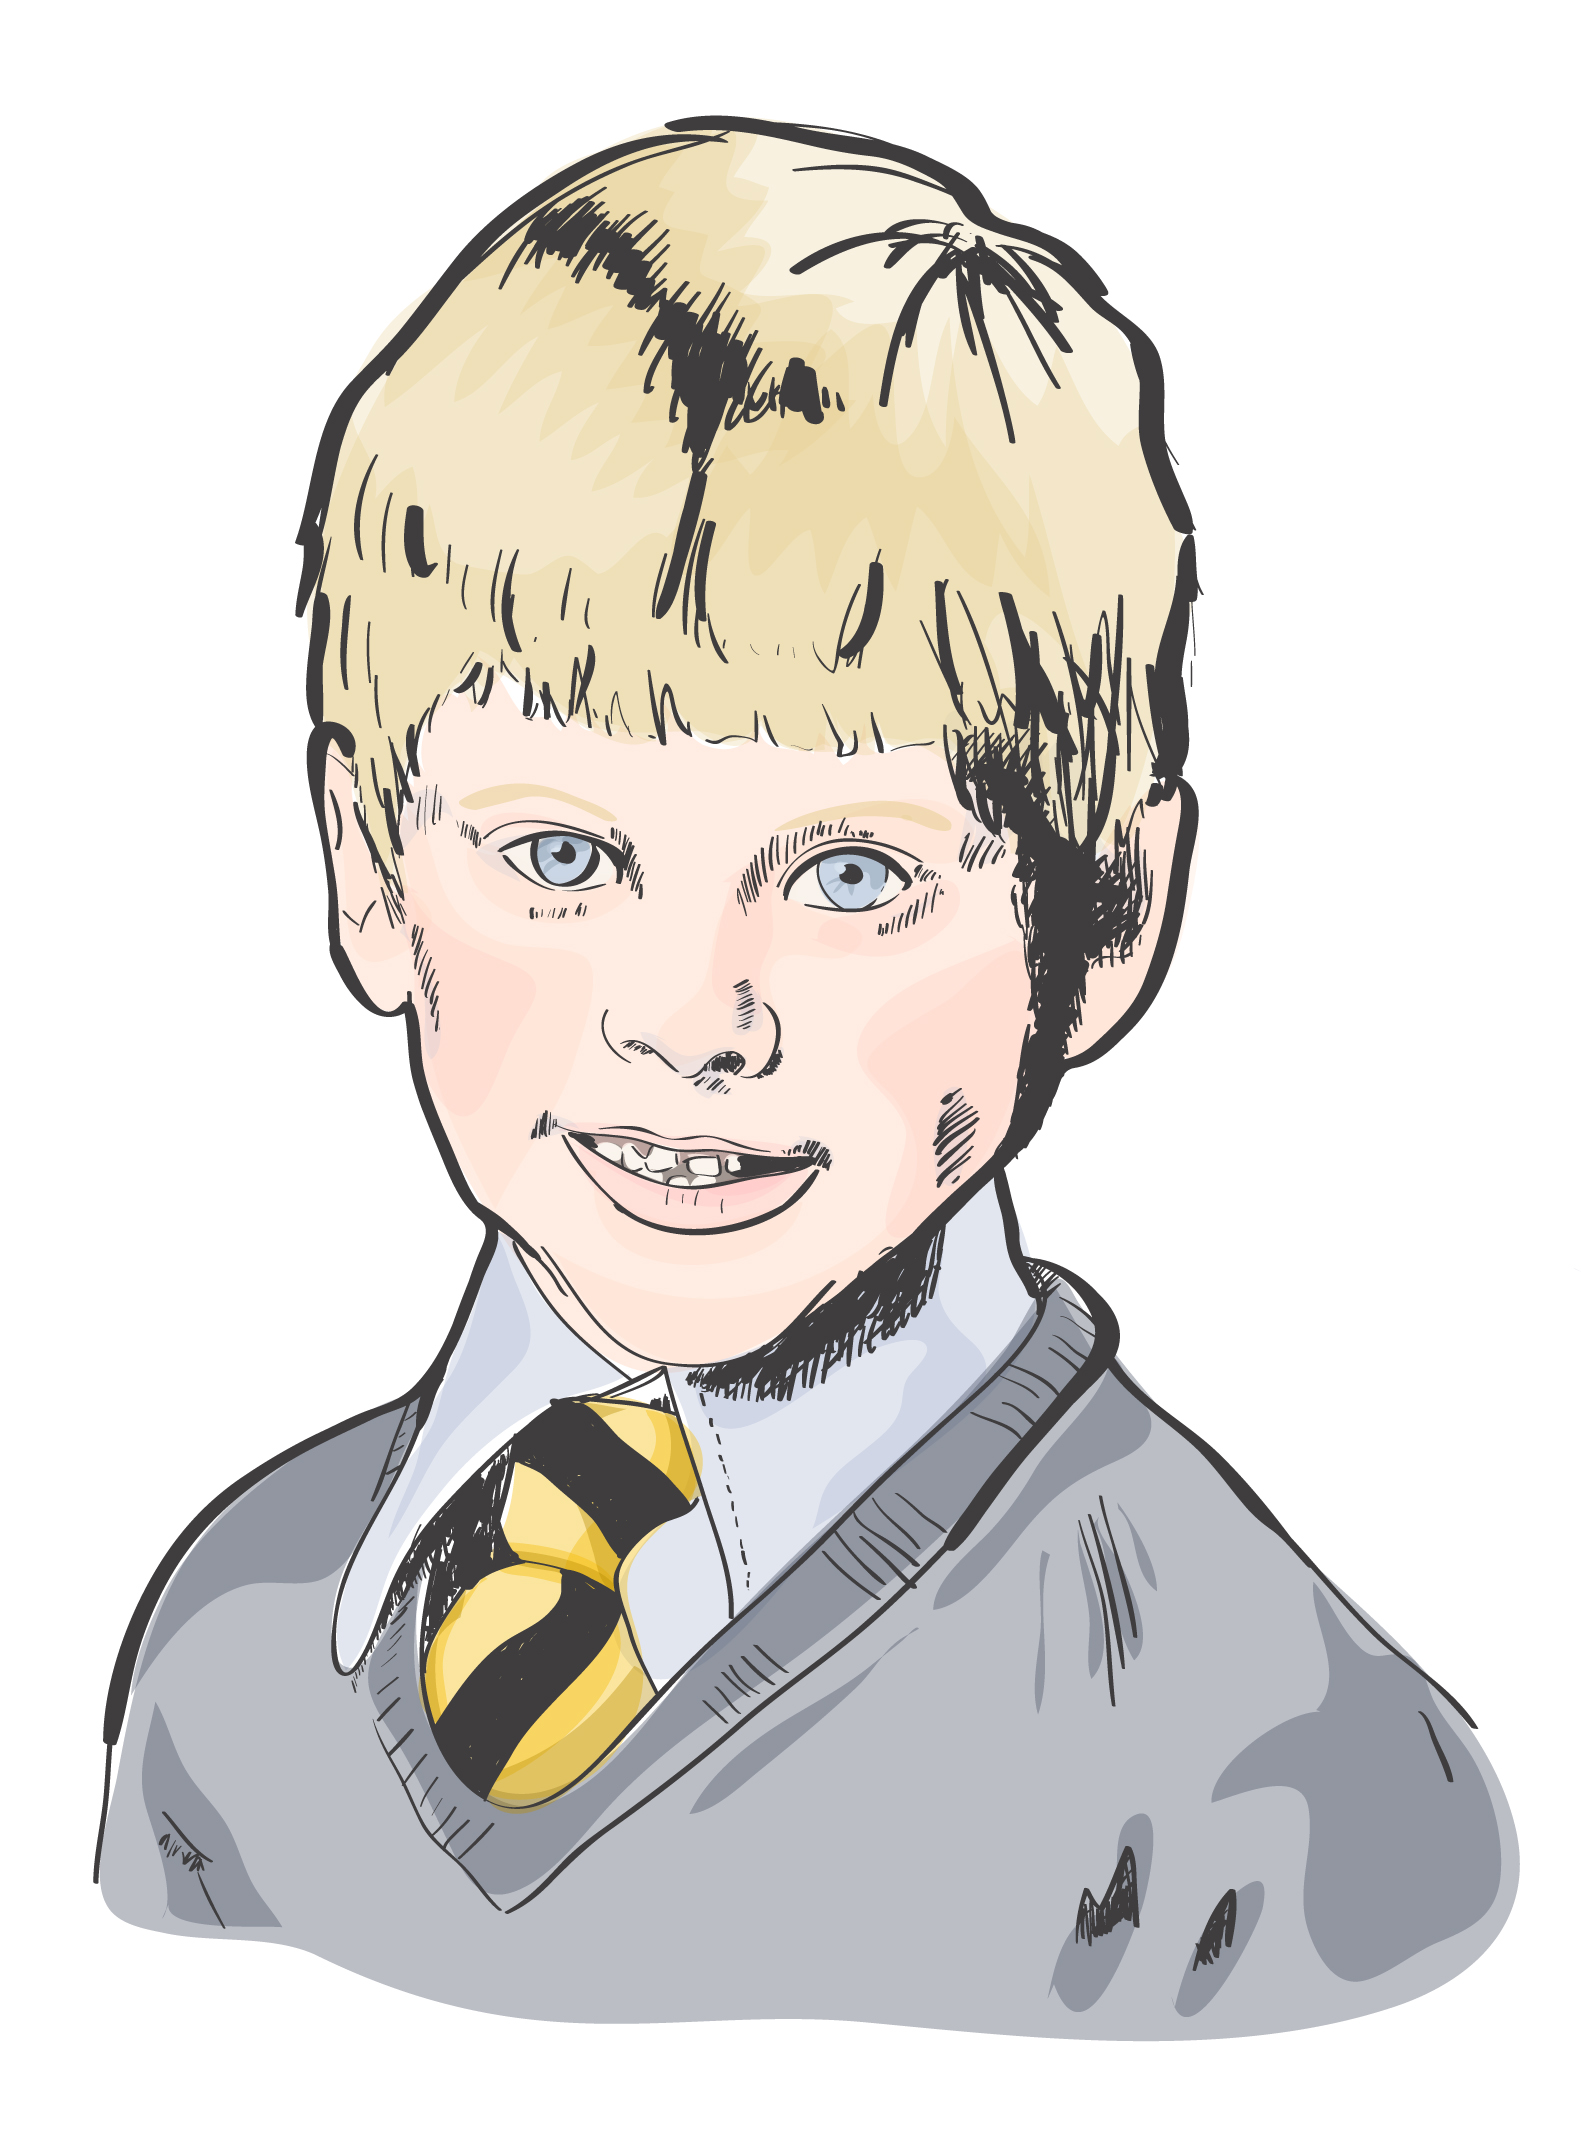 Drawn photos boy School More school Hand a